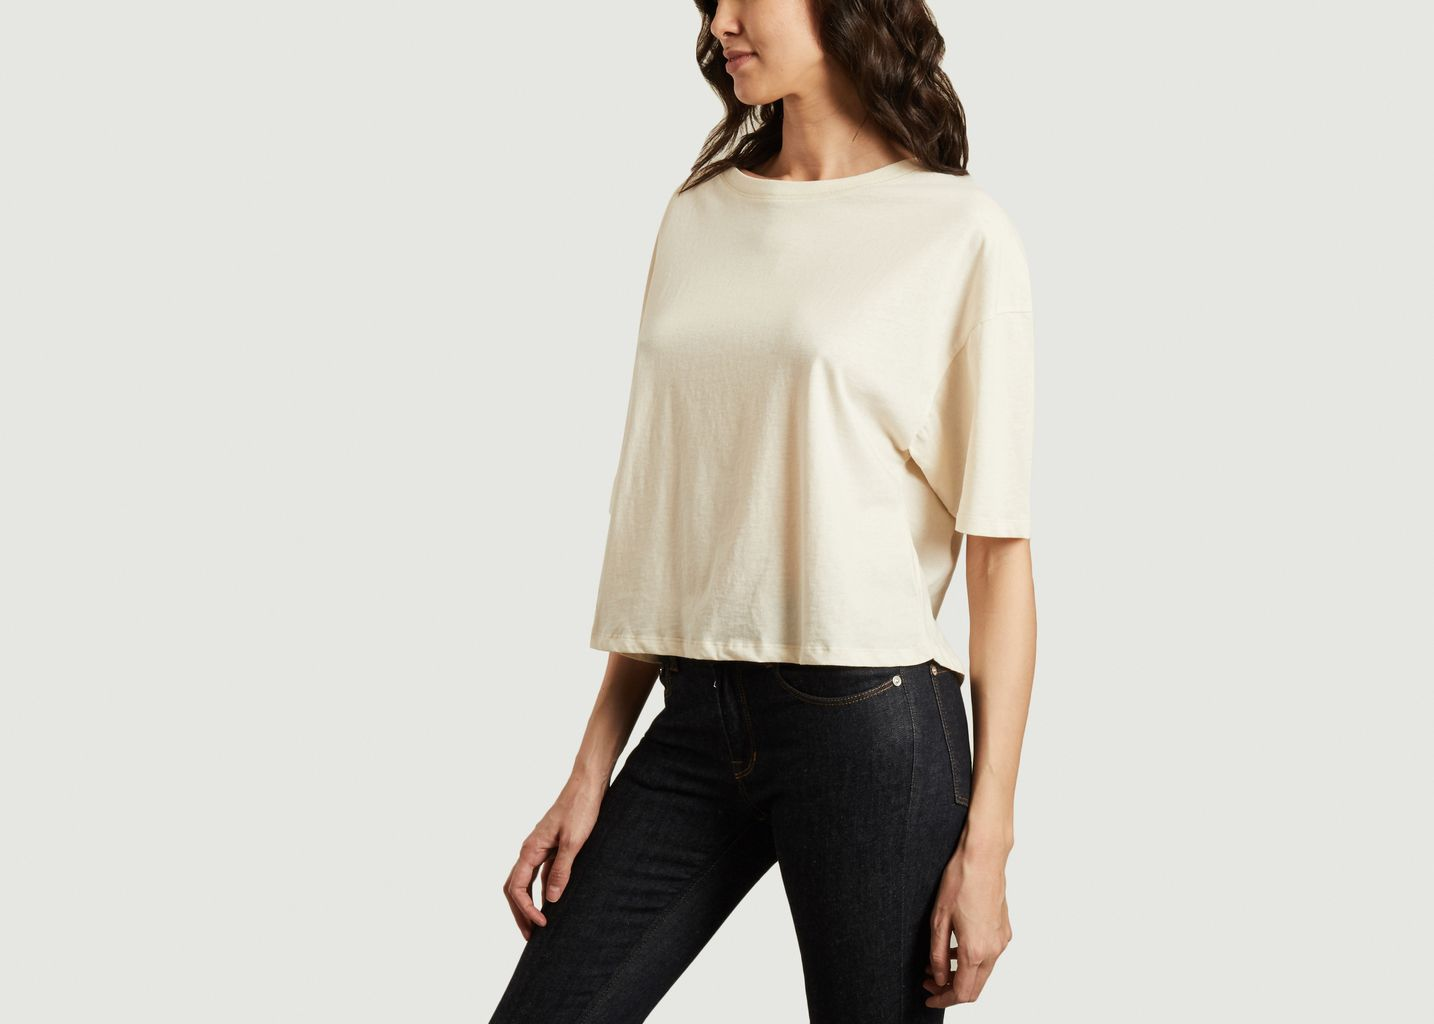 Tshirt CYLBAY - American Vintage